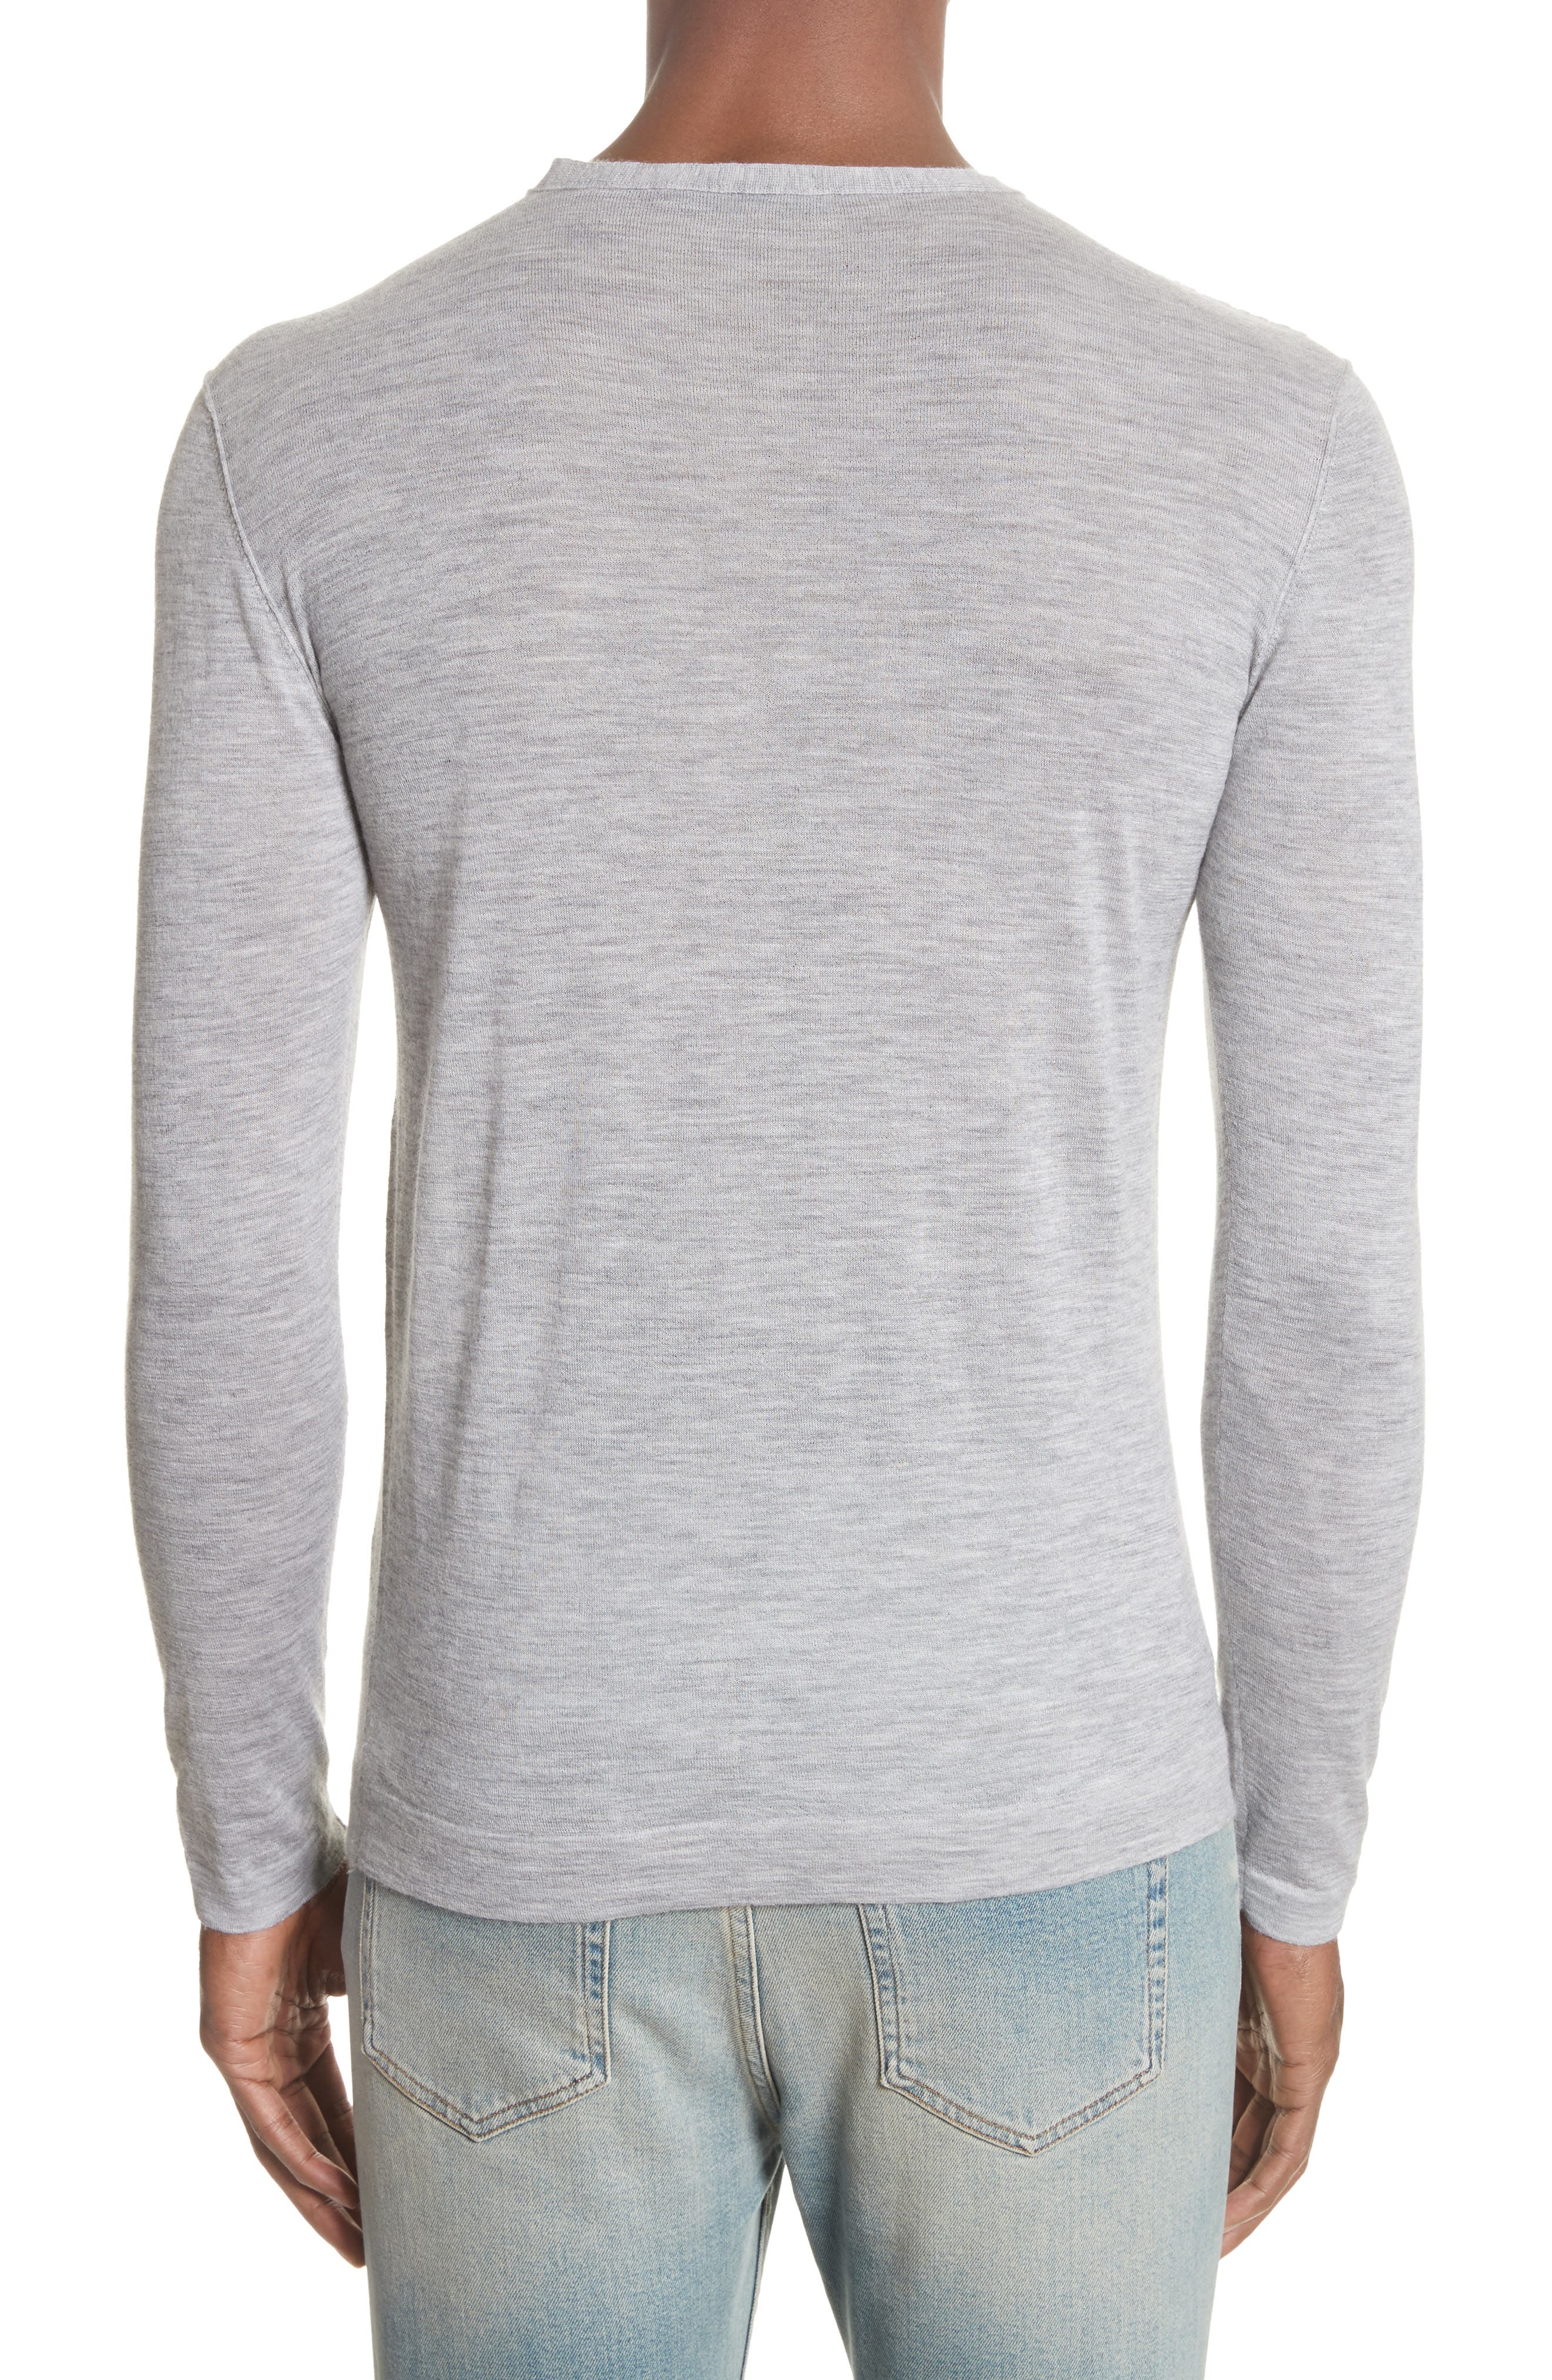 Cashmere Crewneck Sweater,                             Alternate thumbnail 2, color,                             055